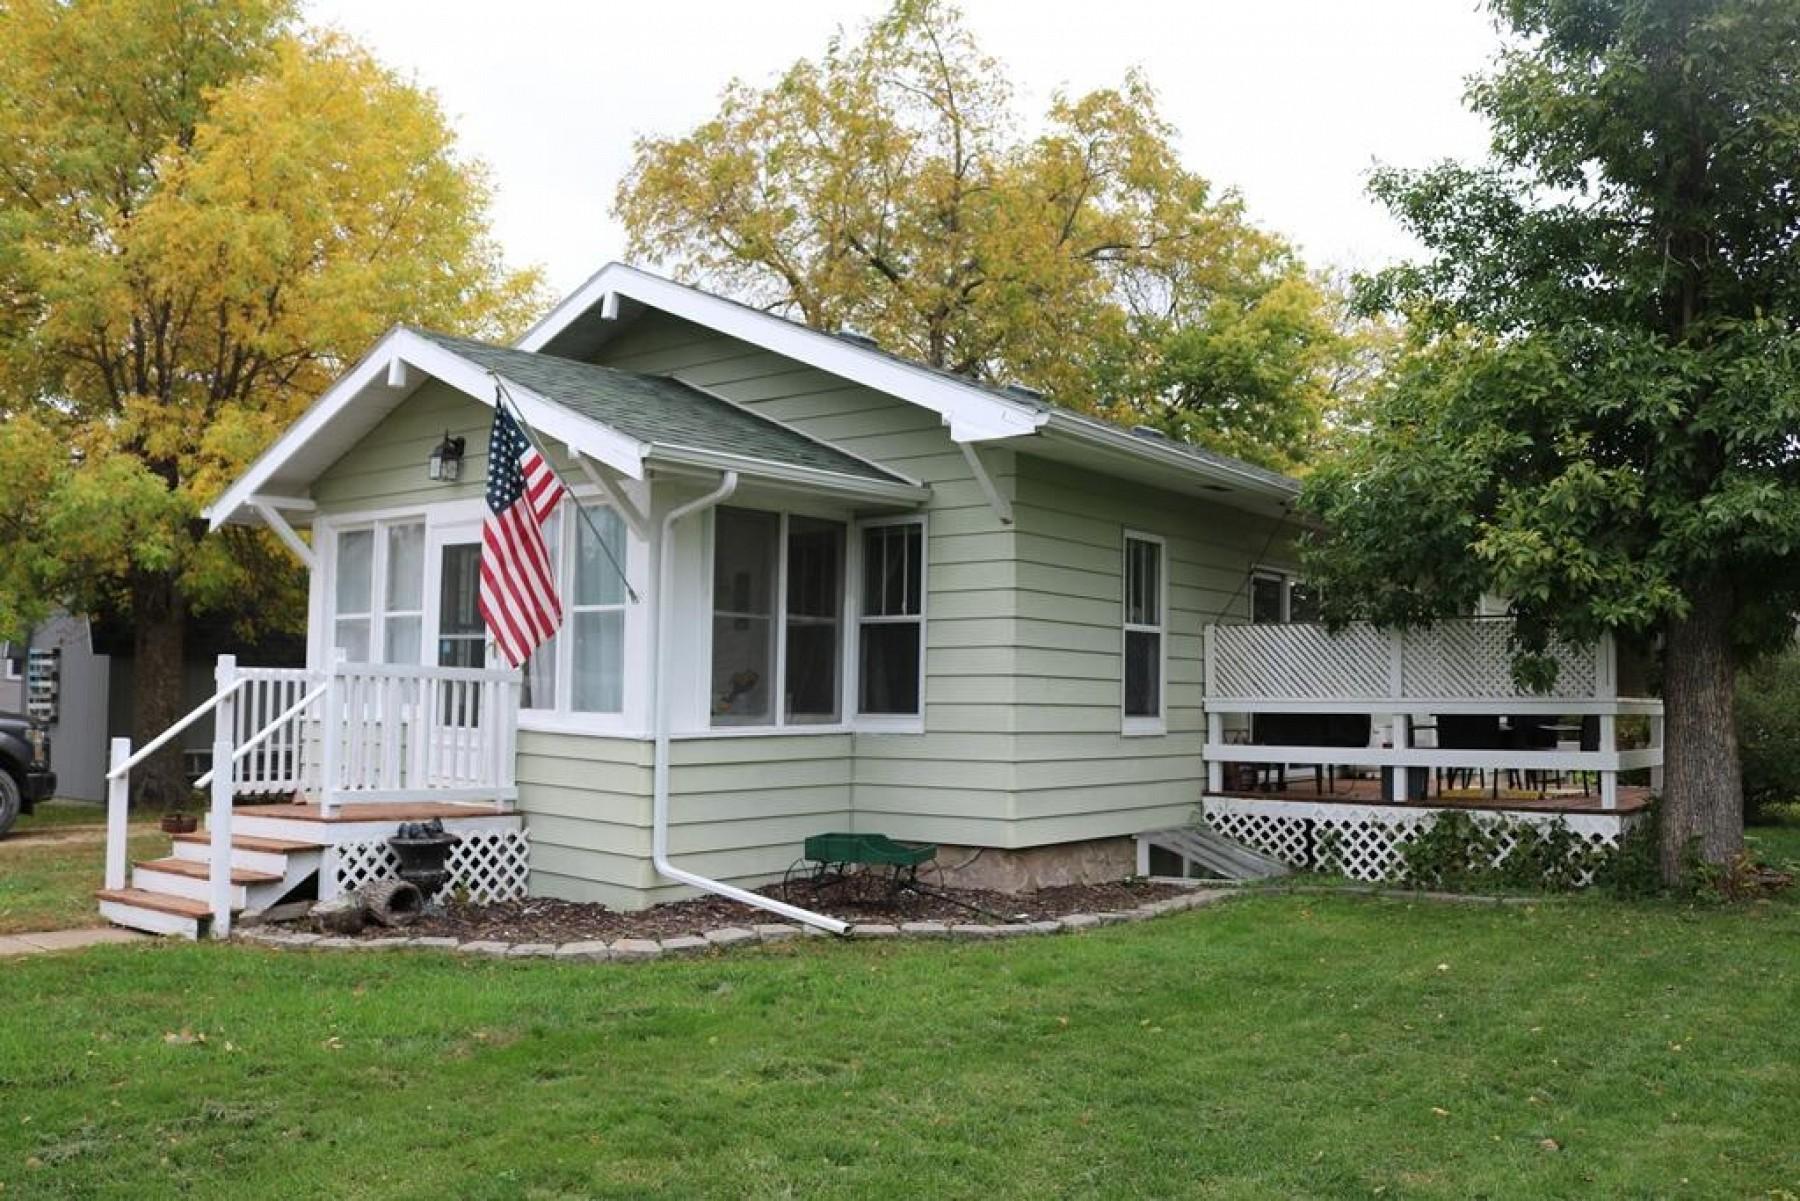 122 BeaverStreetS, Elkton, SD 57026